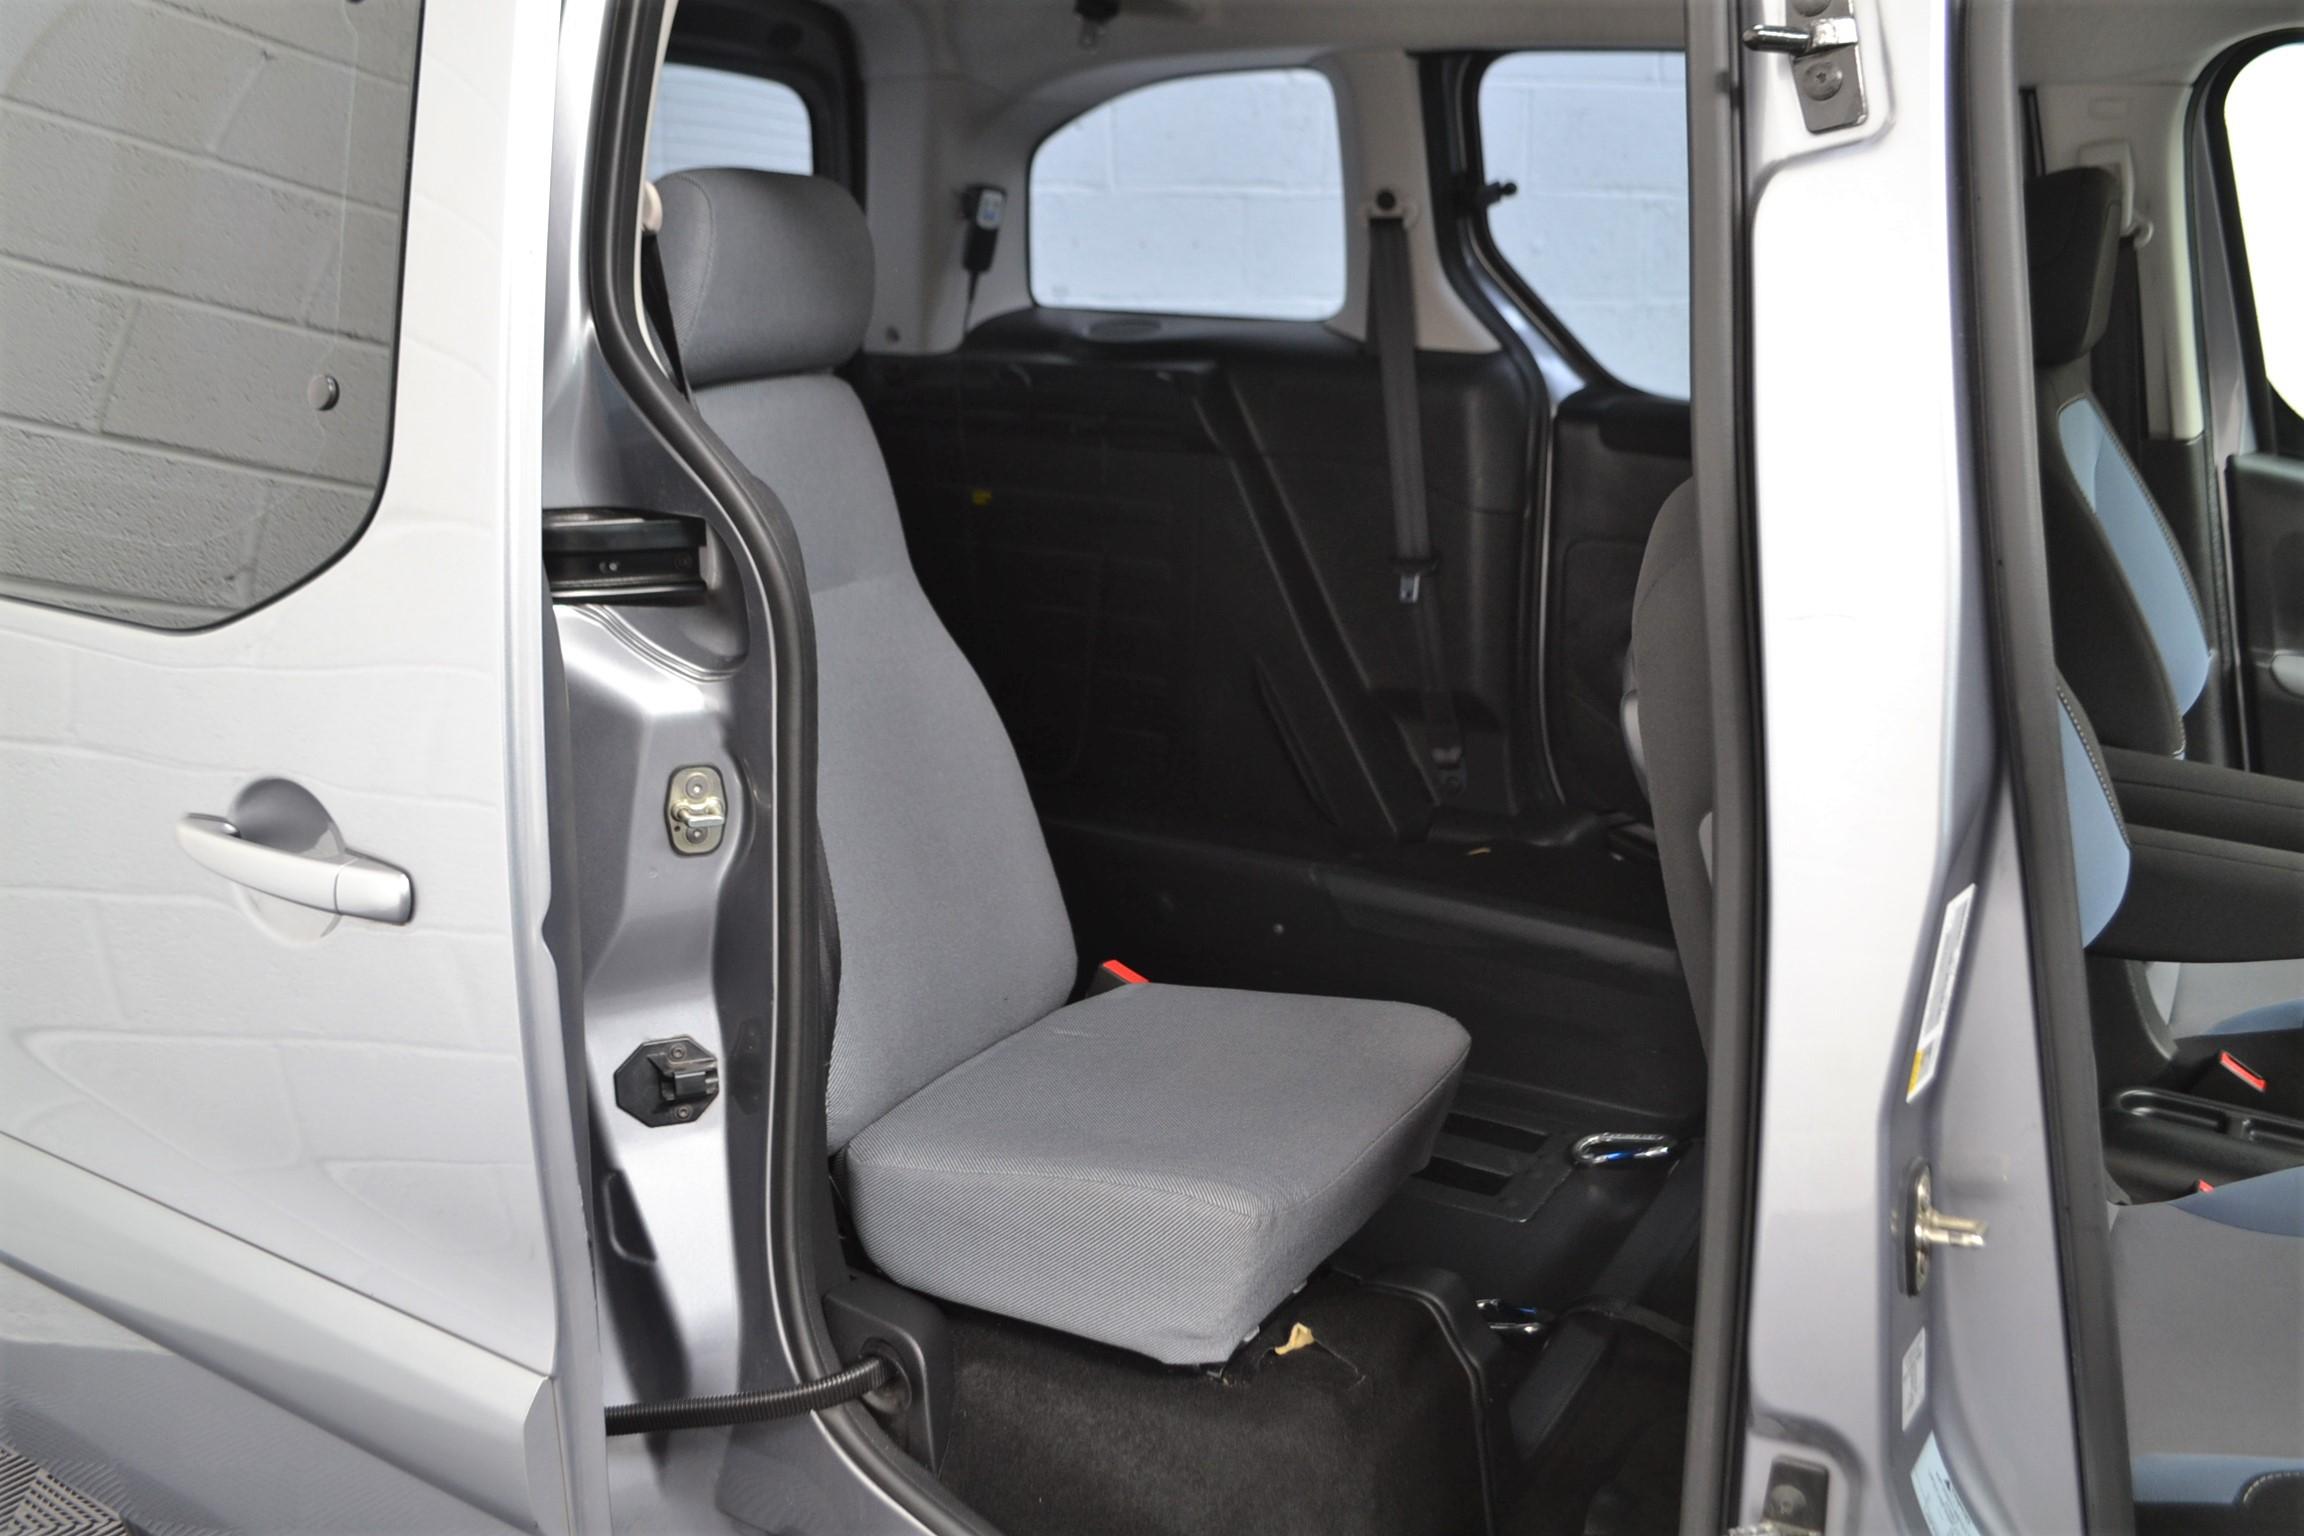 Used Wav Cars for Sale UK Citroen Berlingo WAV Car Peugeot Partner Petrol Wheelchair Accessible Vehicles Buy Sell Bristol Somerset Devon Dorset 19